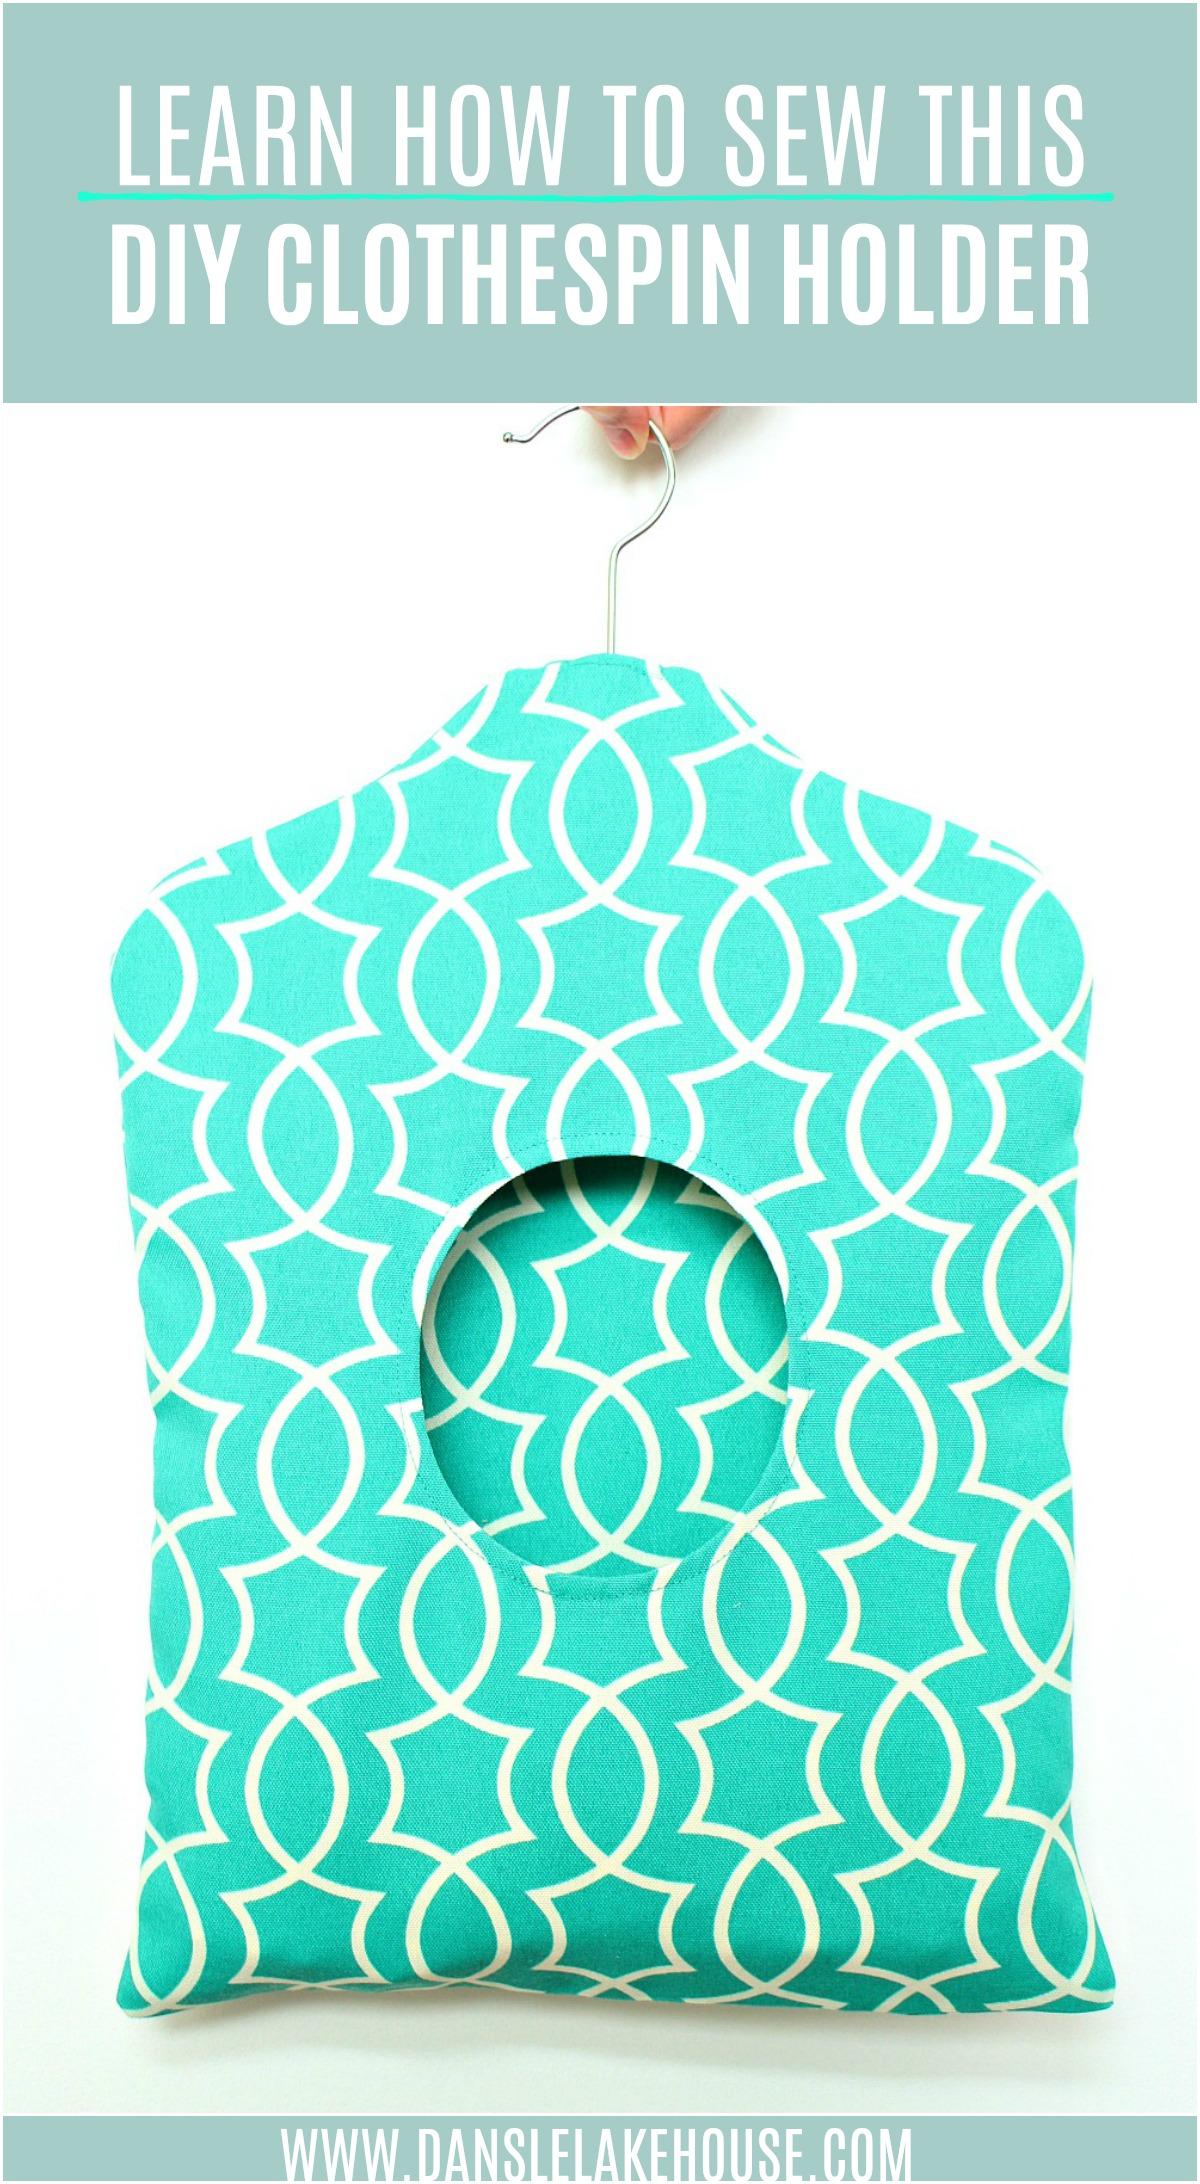 fabric DIY clothespin holder tutorial